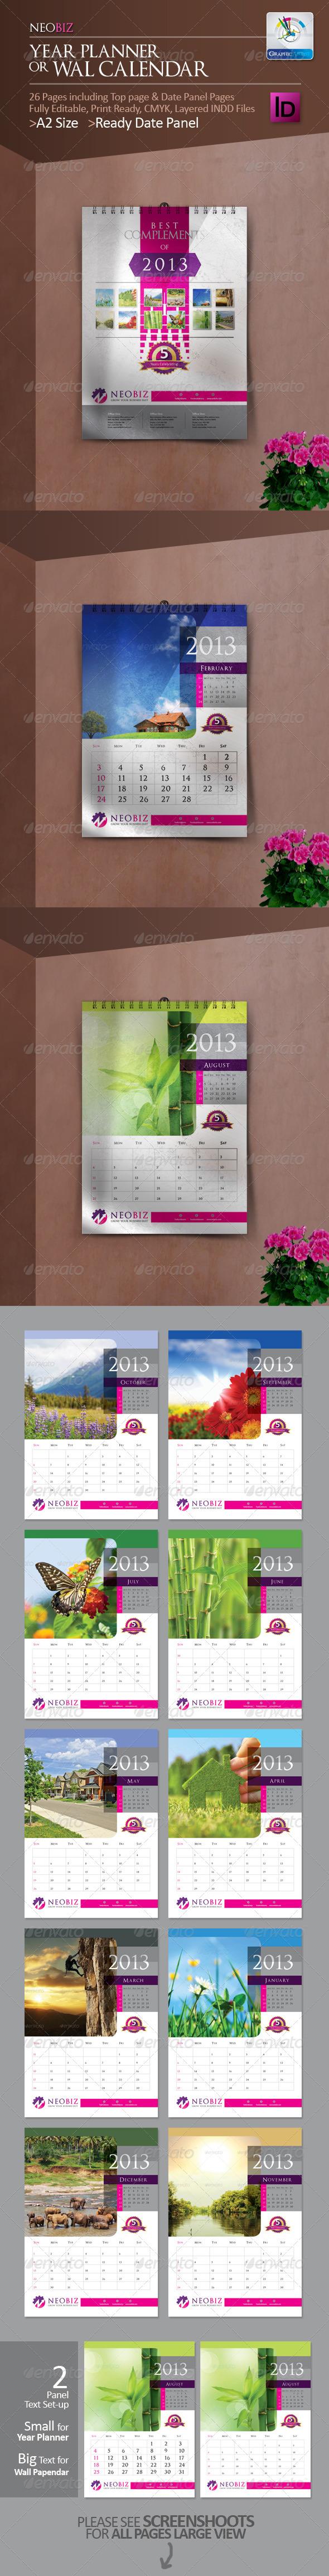 GraphicRiver NeoBiz Year Planner Wall Calendar 3396652